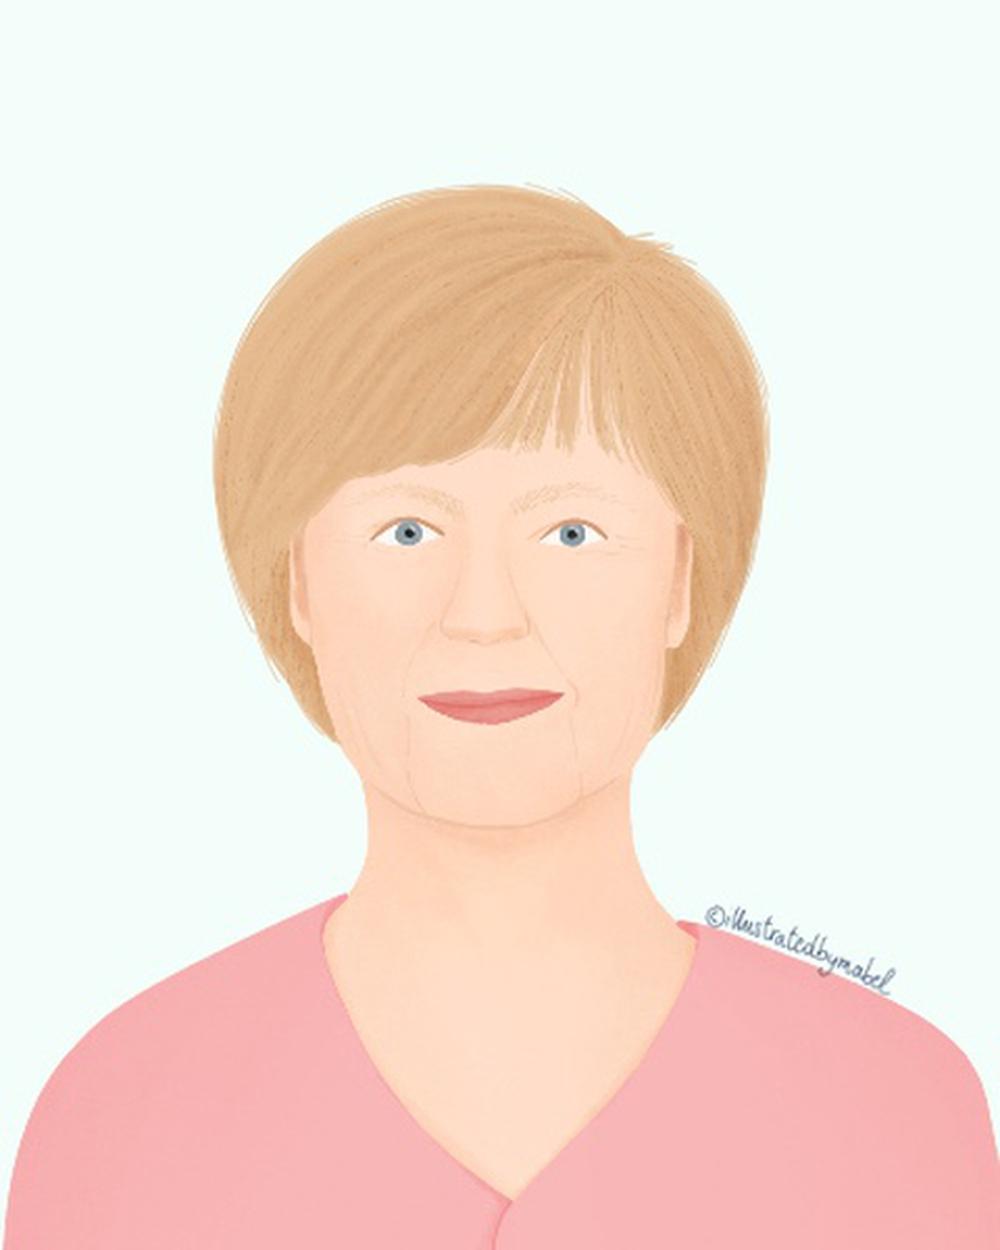 Woman portrait illustration Angela Merkel